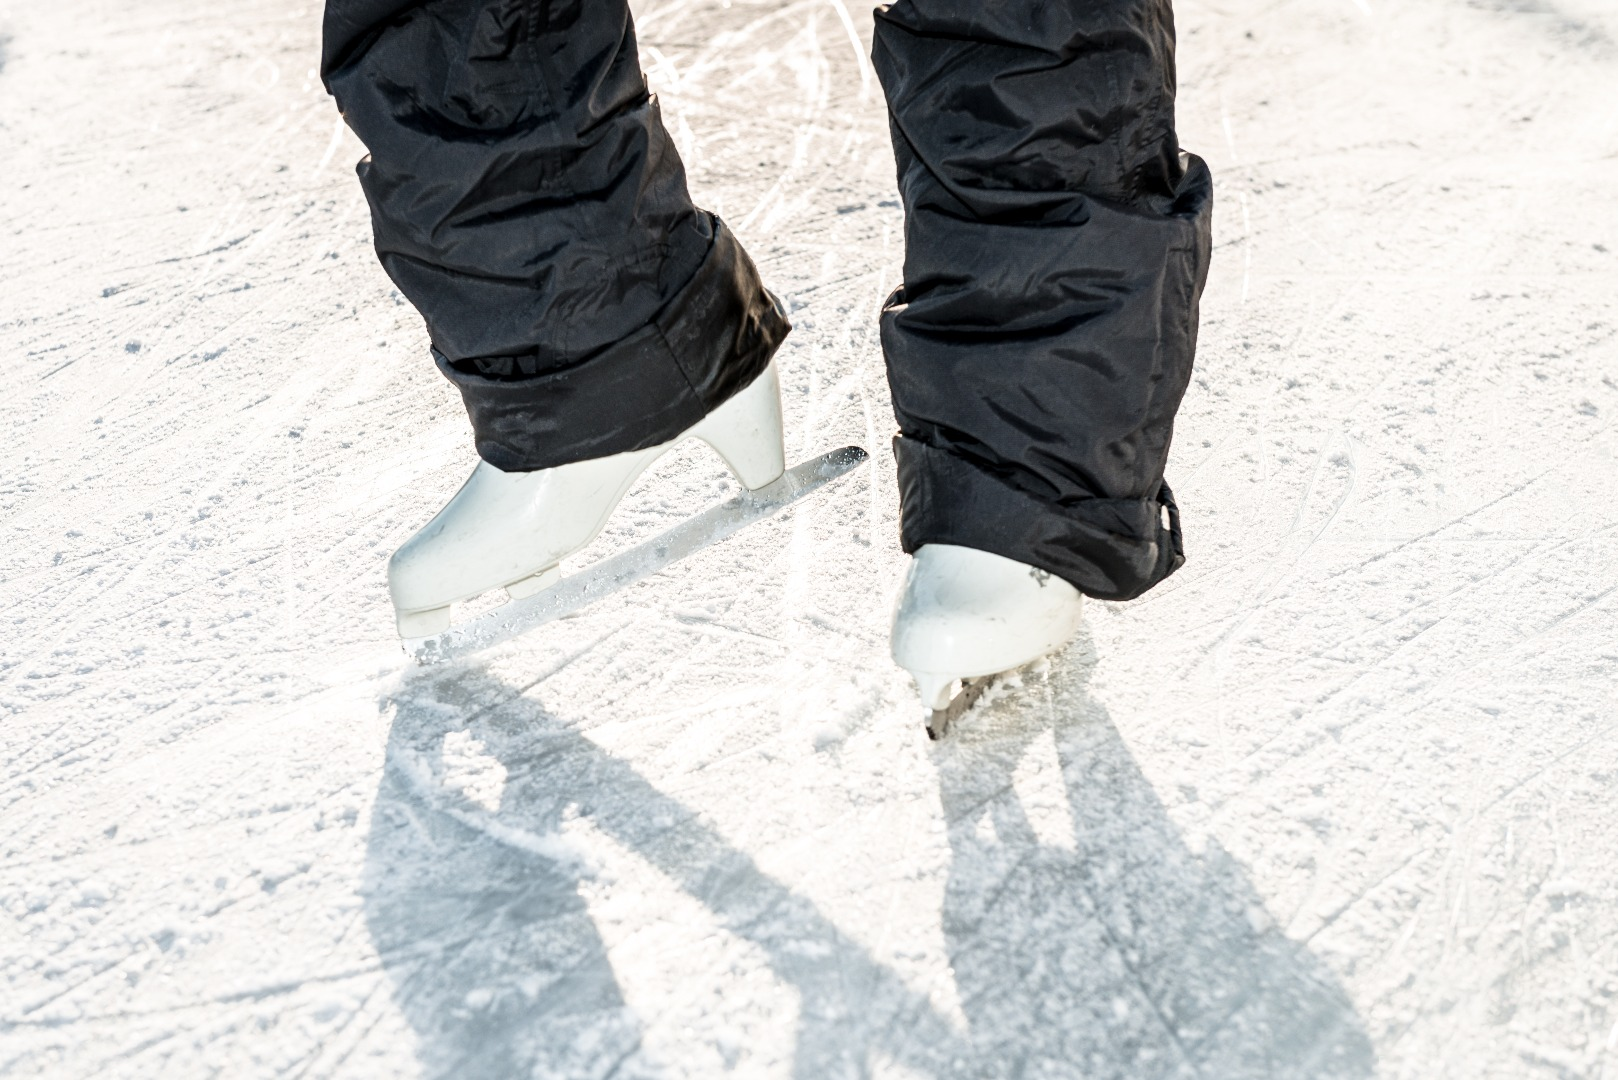 Eislaufplatz Weerberg